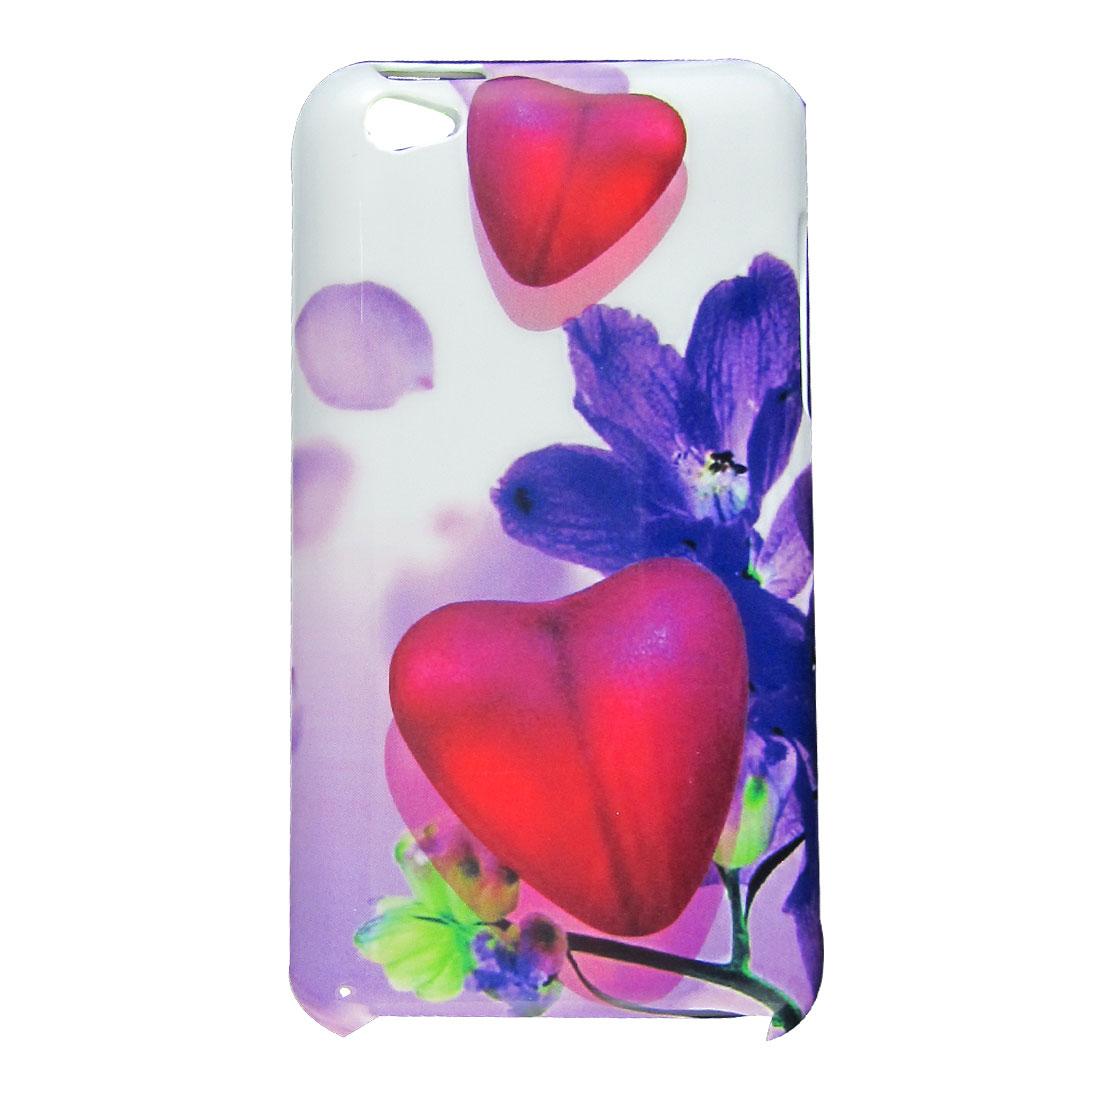 Heart Pattern Purple Flower White Plastic IMD Back Case for iPod Touch 4